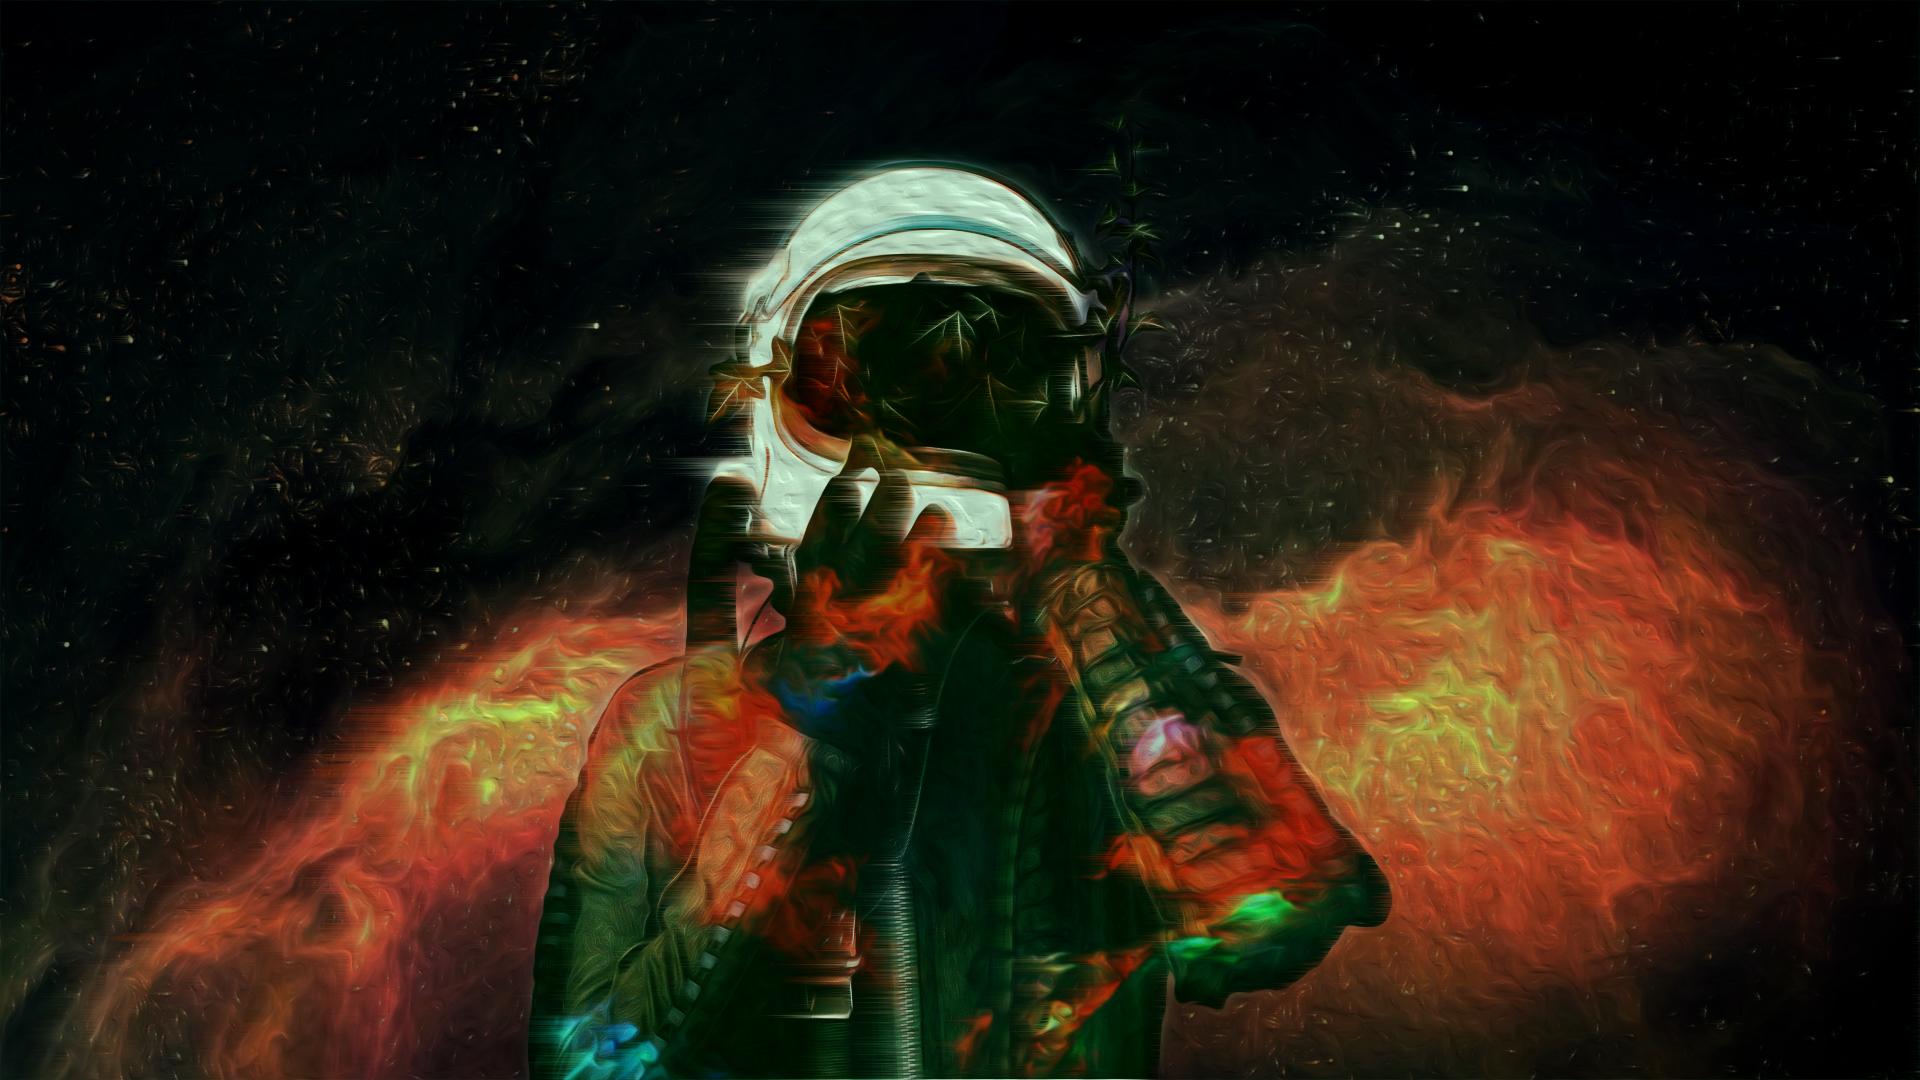 Indian Girl Wallpaper 2560x1440 Jpg 3840x2400 Astronaut Space Abstract 4k Hd 4k Wallpapers